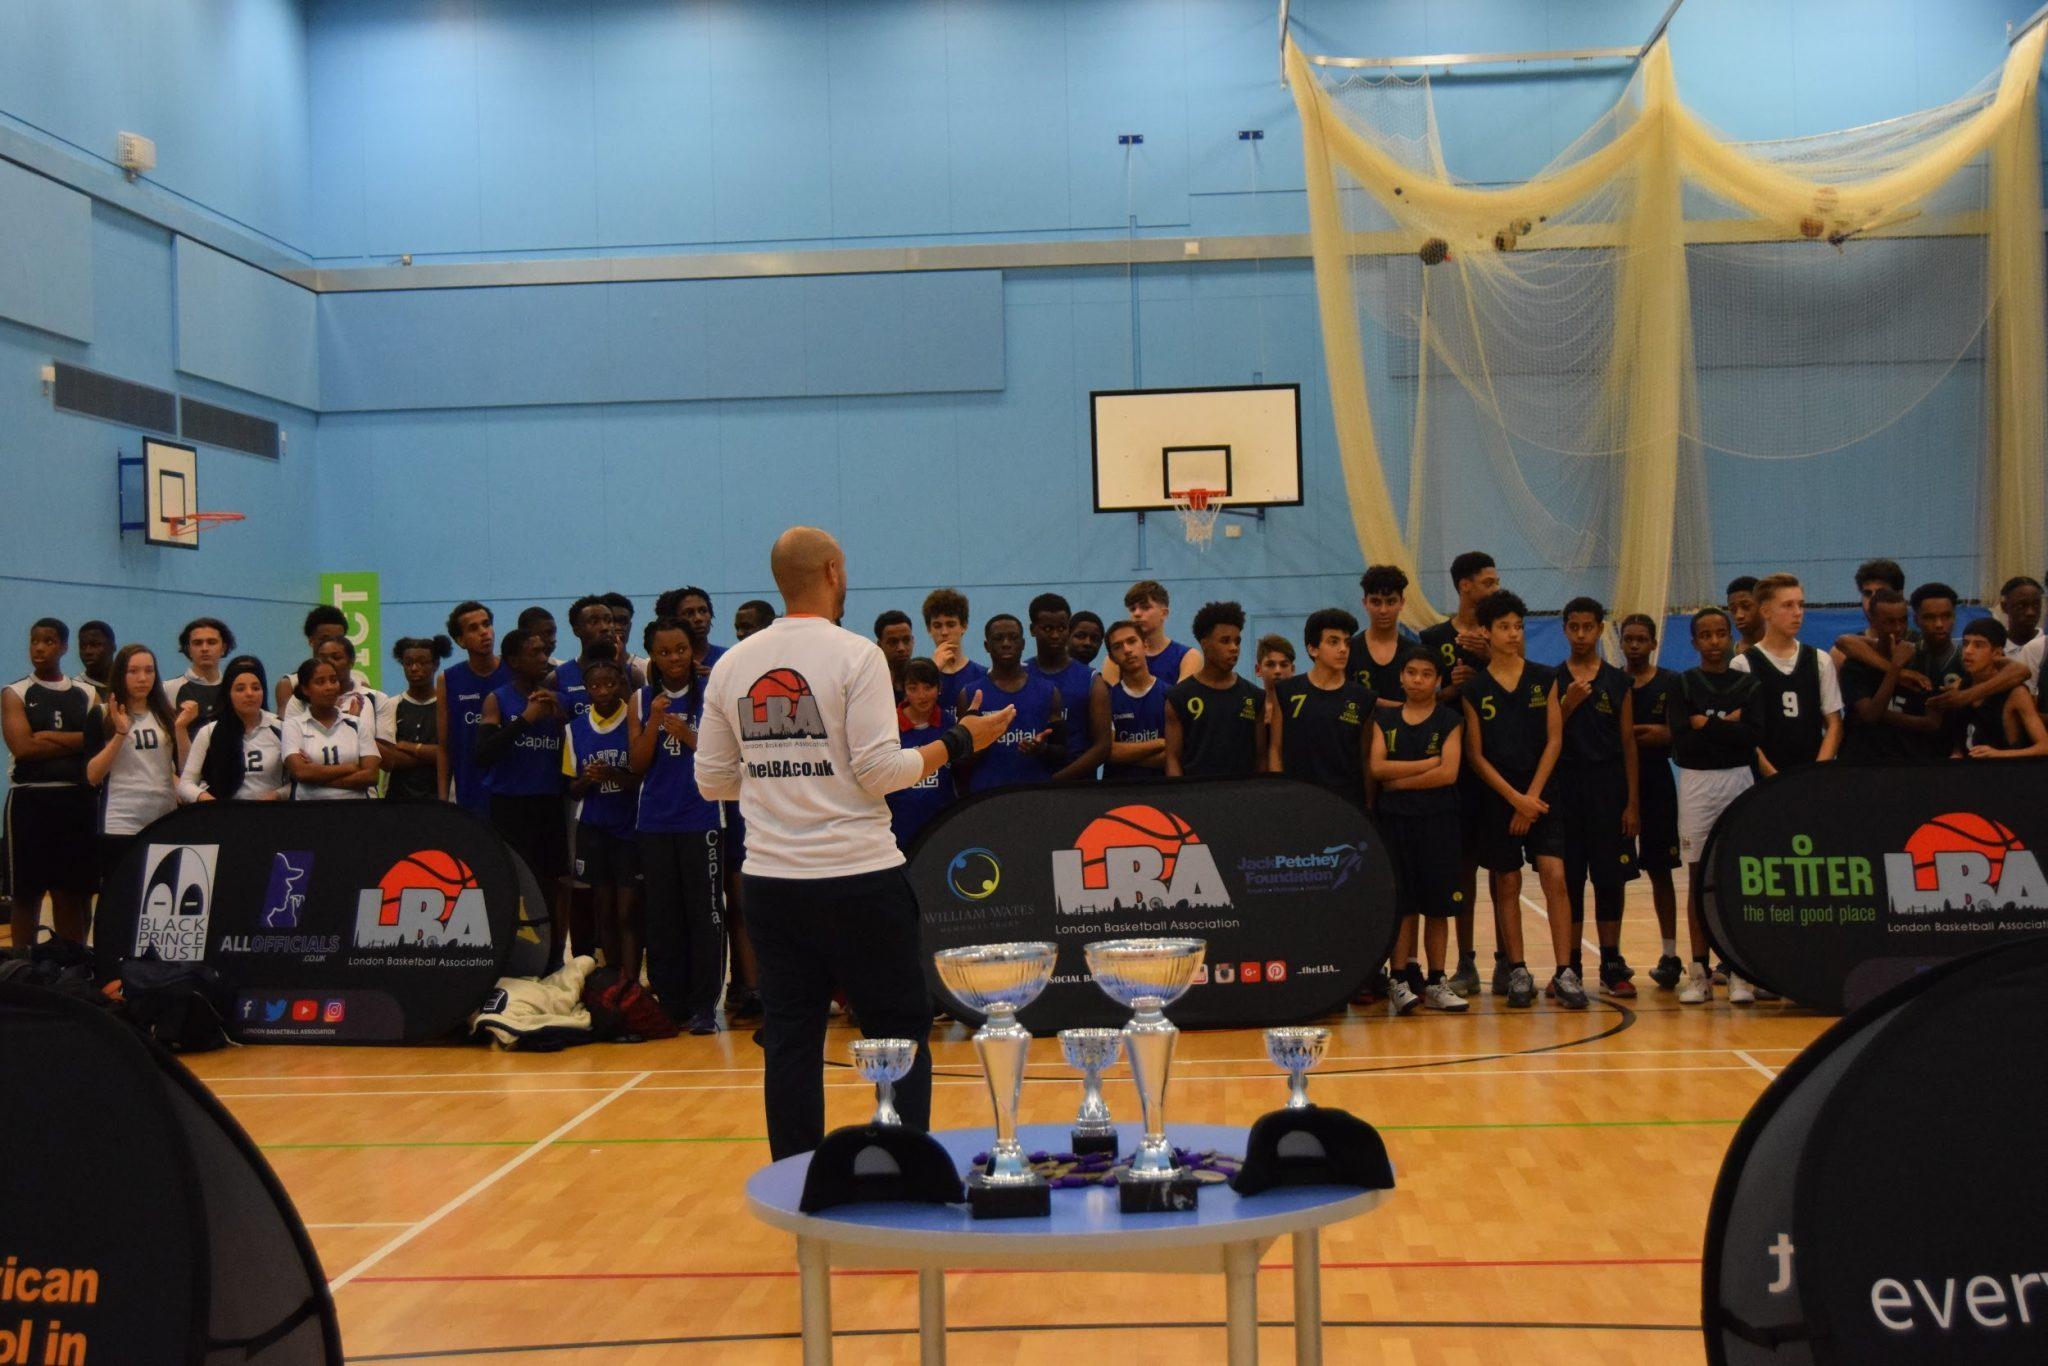 Brent School Tournament 2019 Cup presentation 2